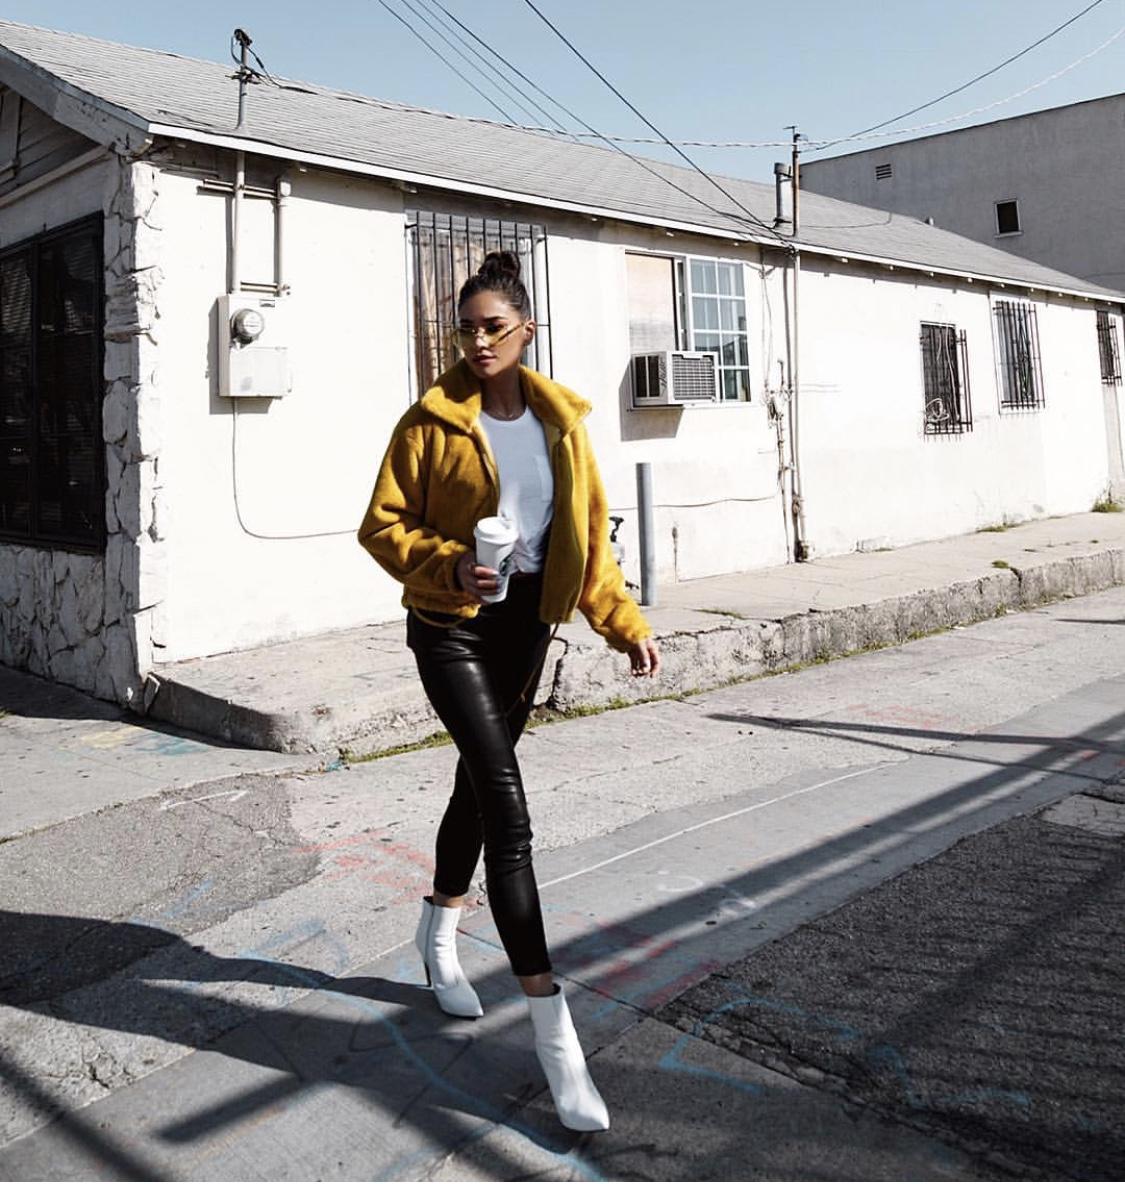 Shay Mitchell / Styled by Natalie Hoselton / Lifestyle